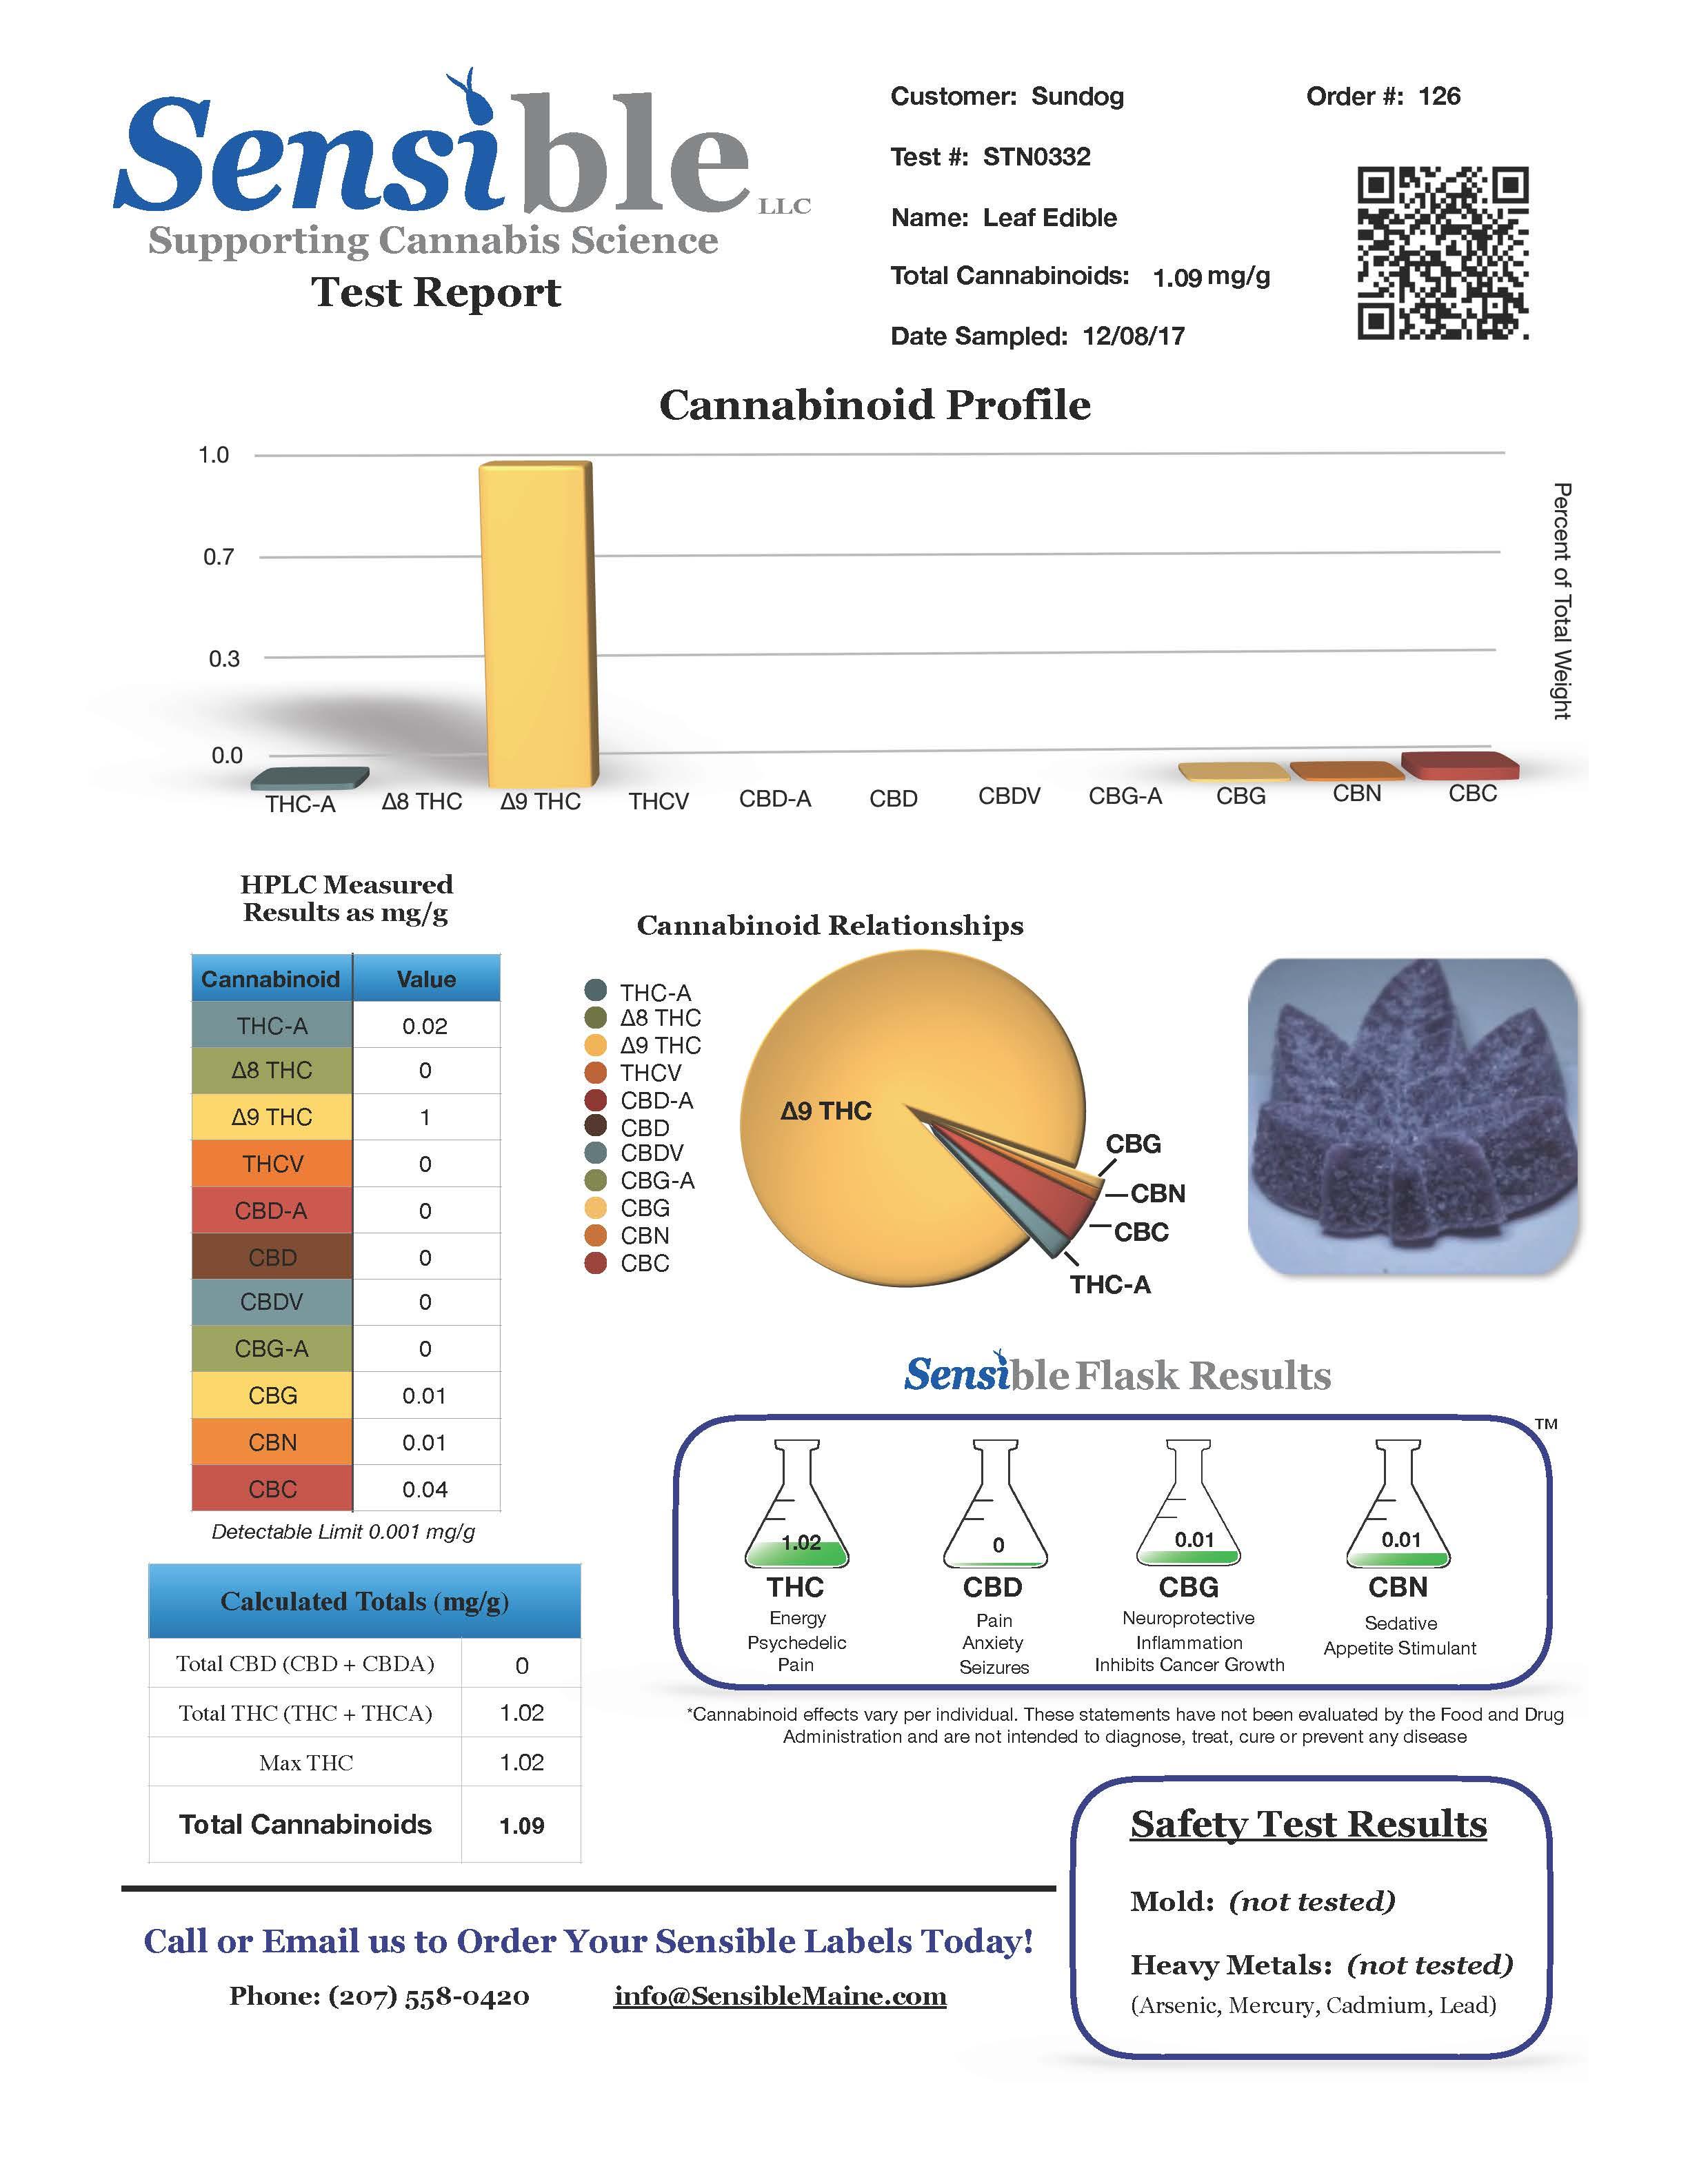 Test Report stn0338.jpg